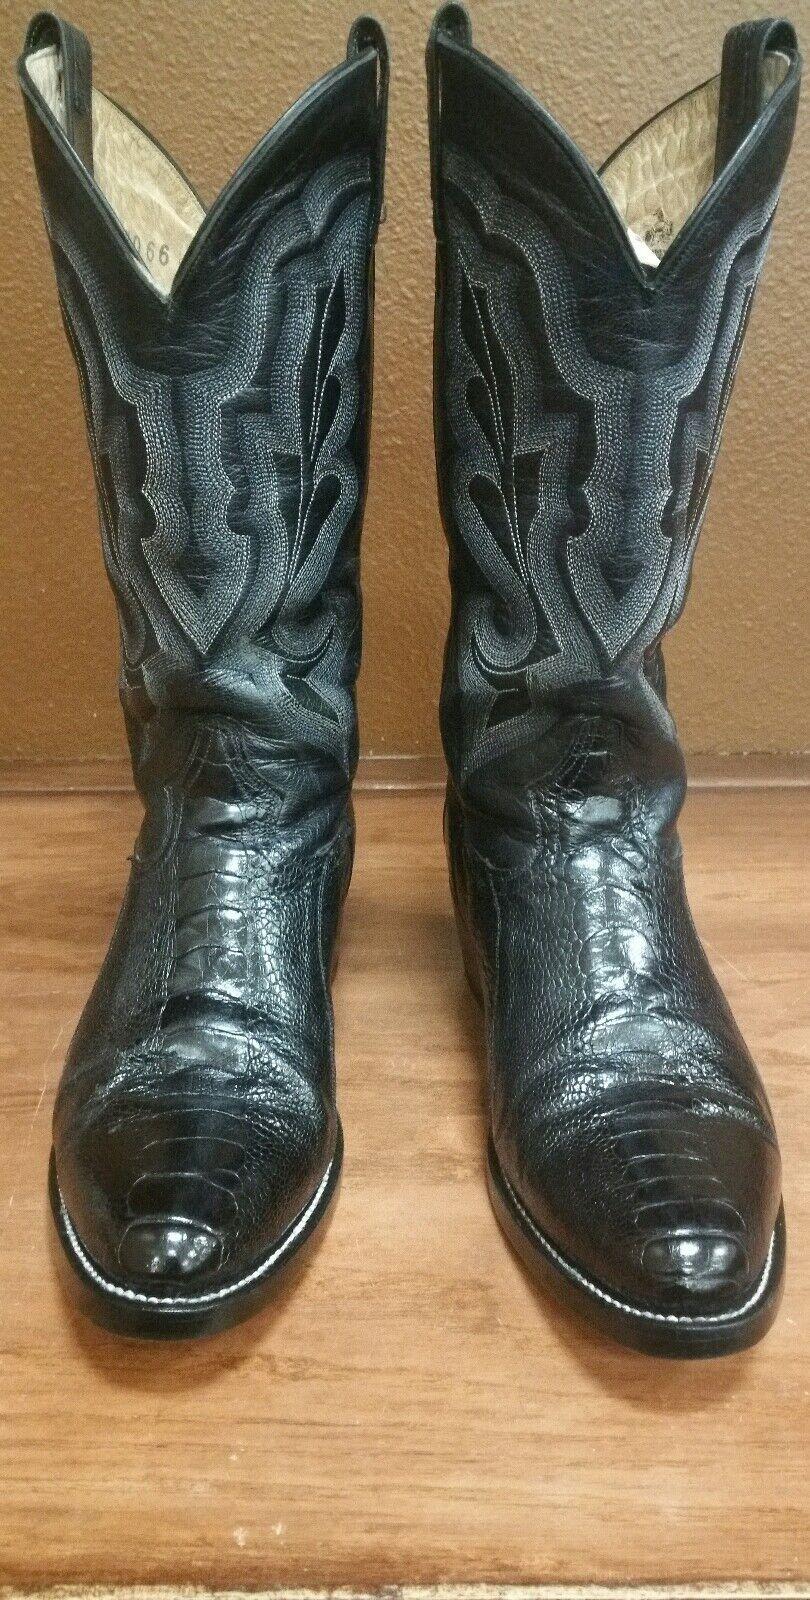 Mens Cowboy Stiefel schwarz Ostrich Leg 7 1 2 D RestGoldt